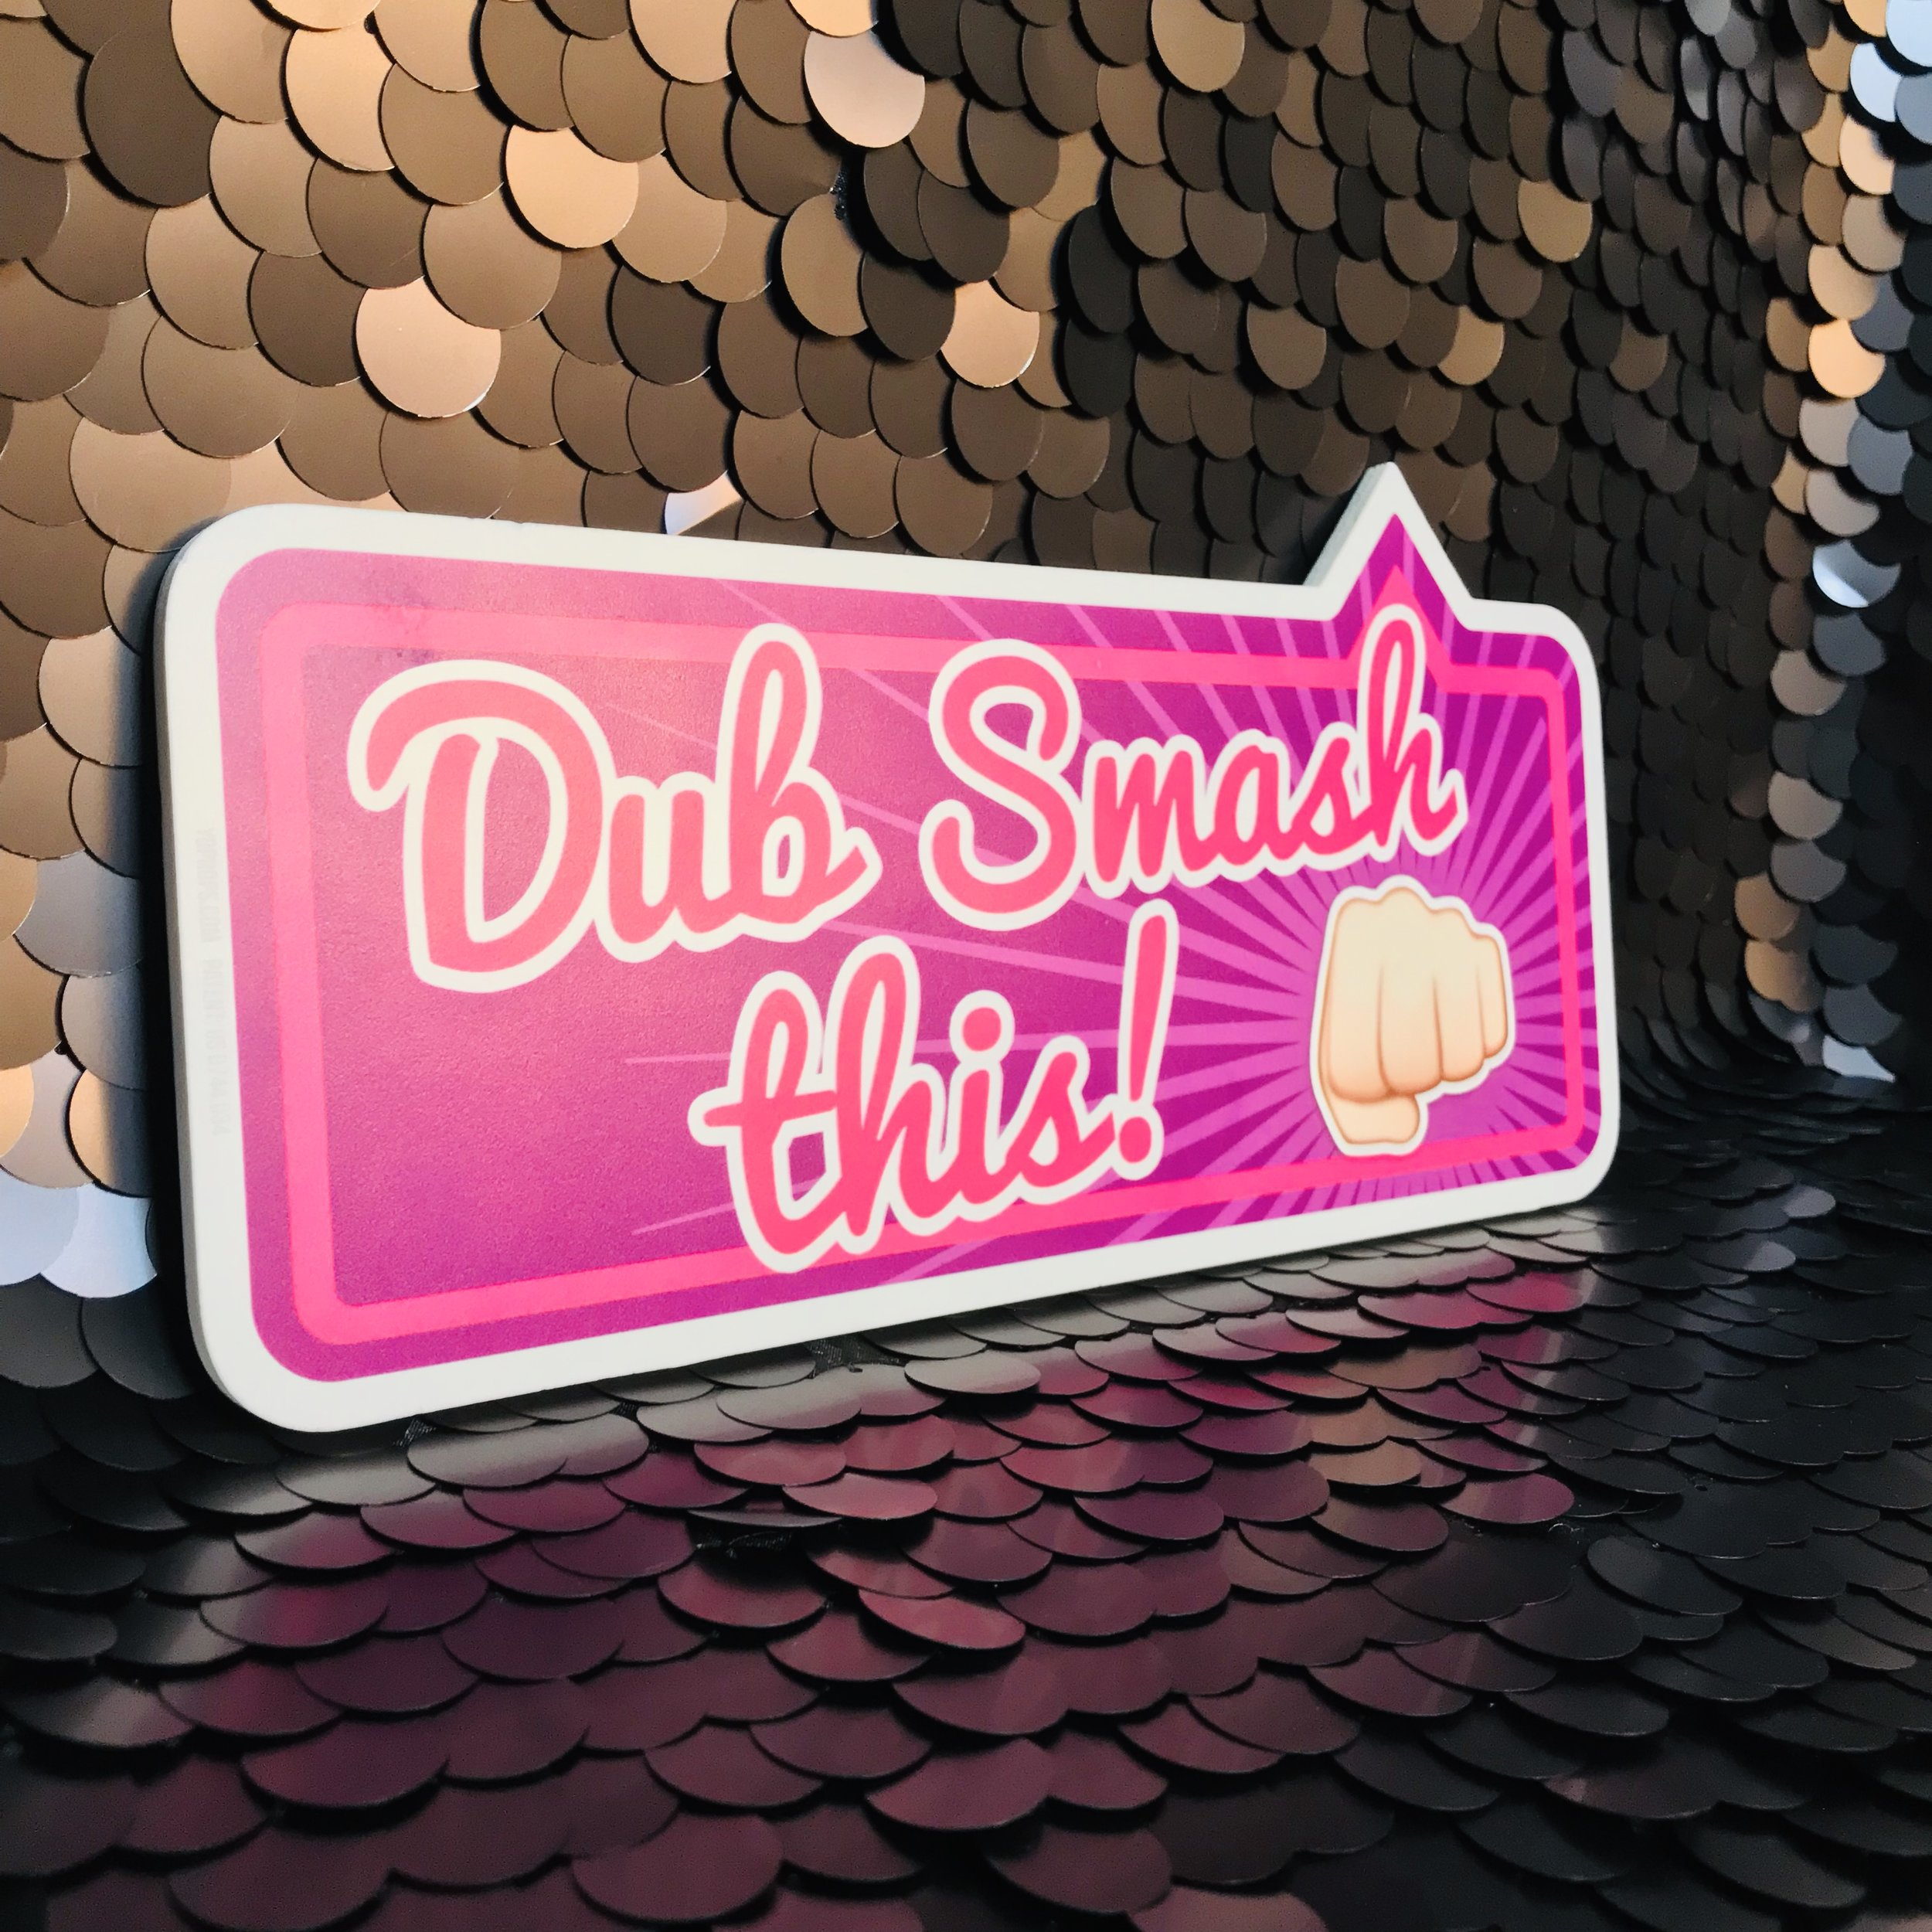 Dub Smash.jpg